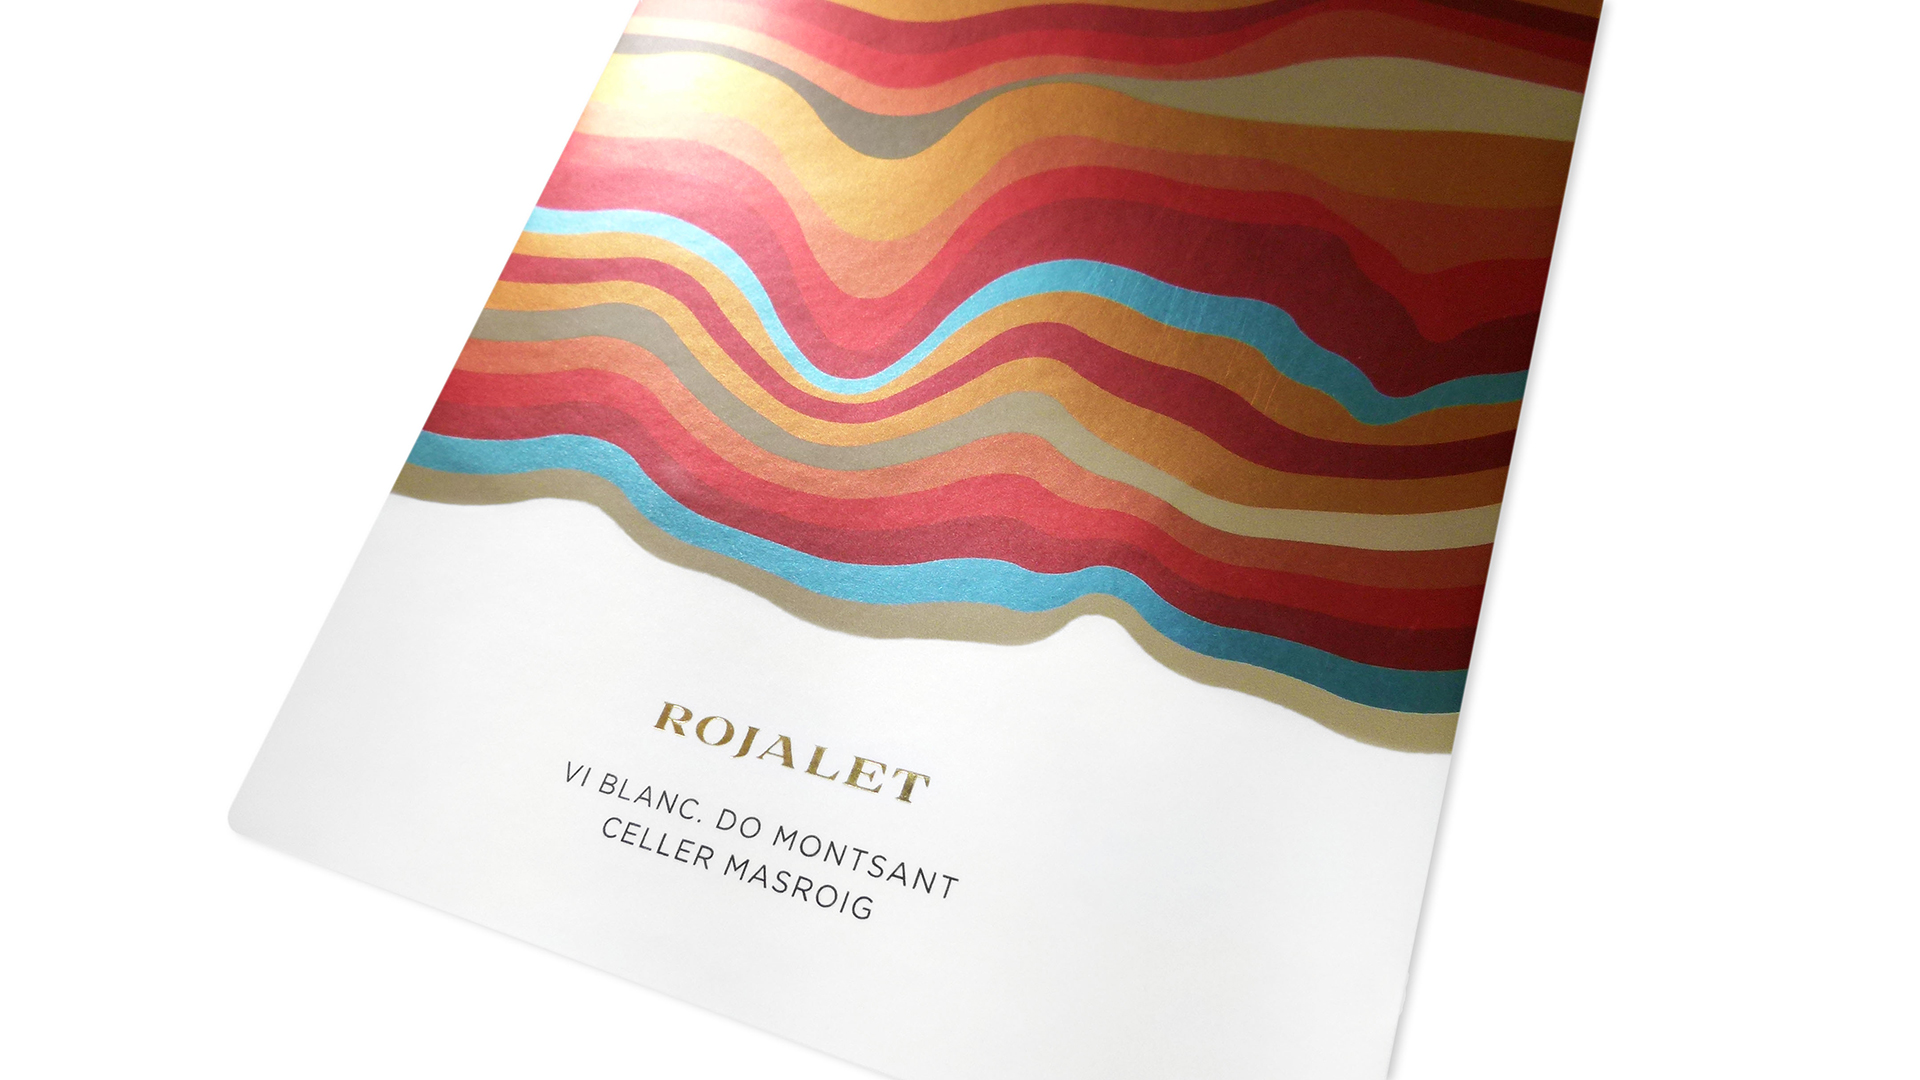 744-rojalet-wine-2